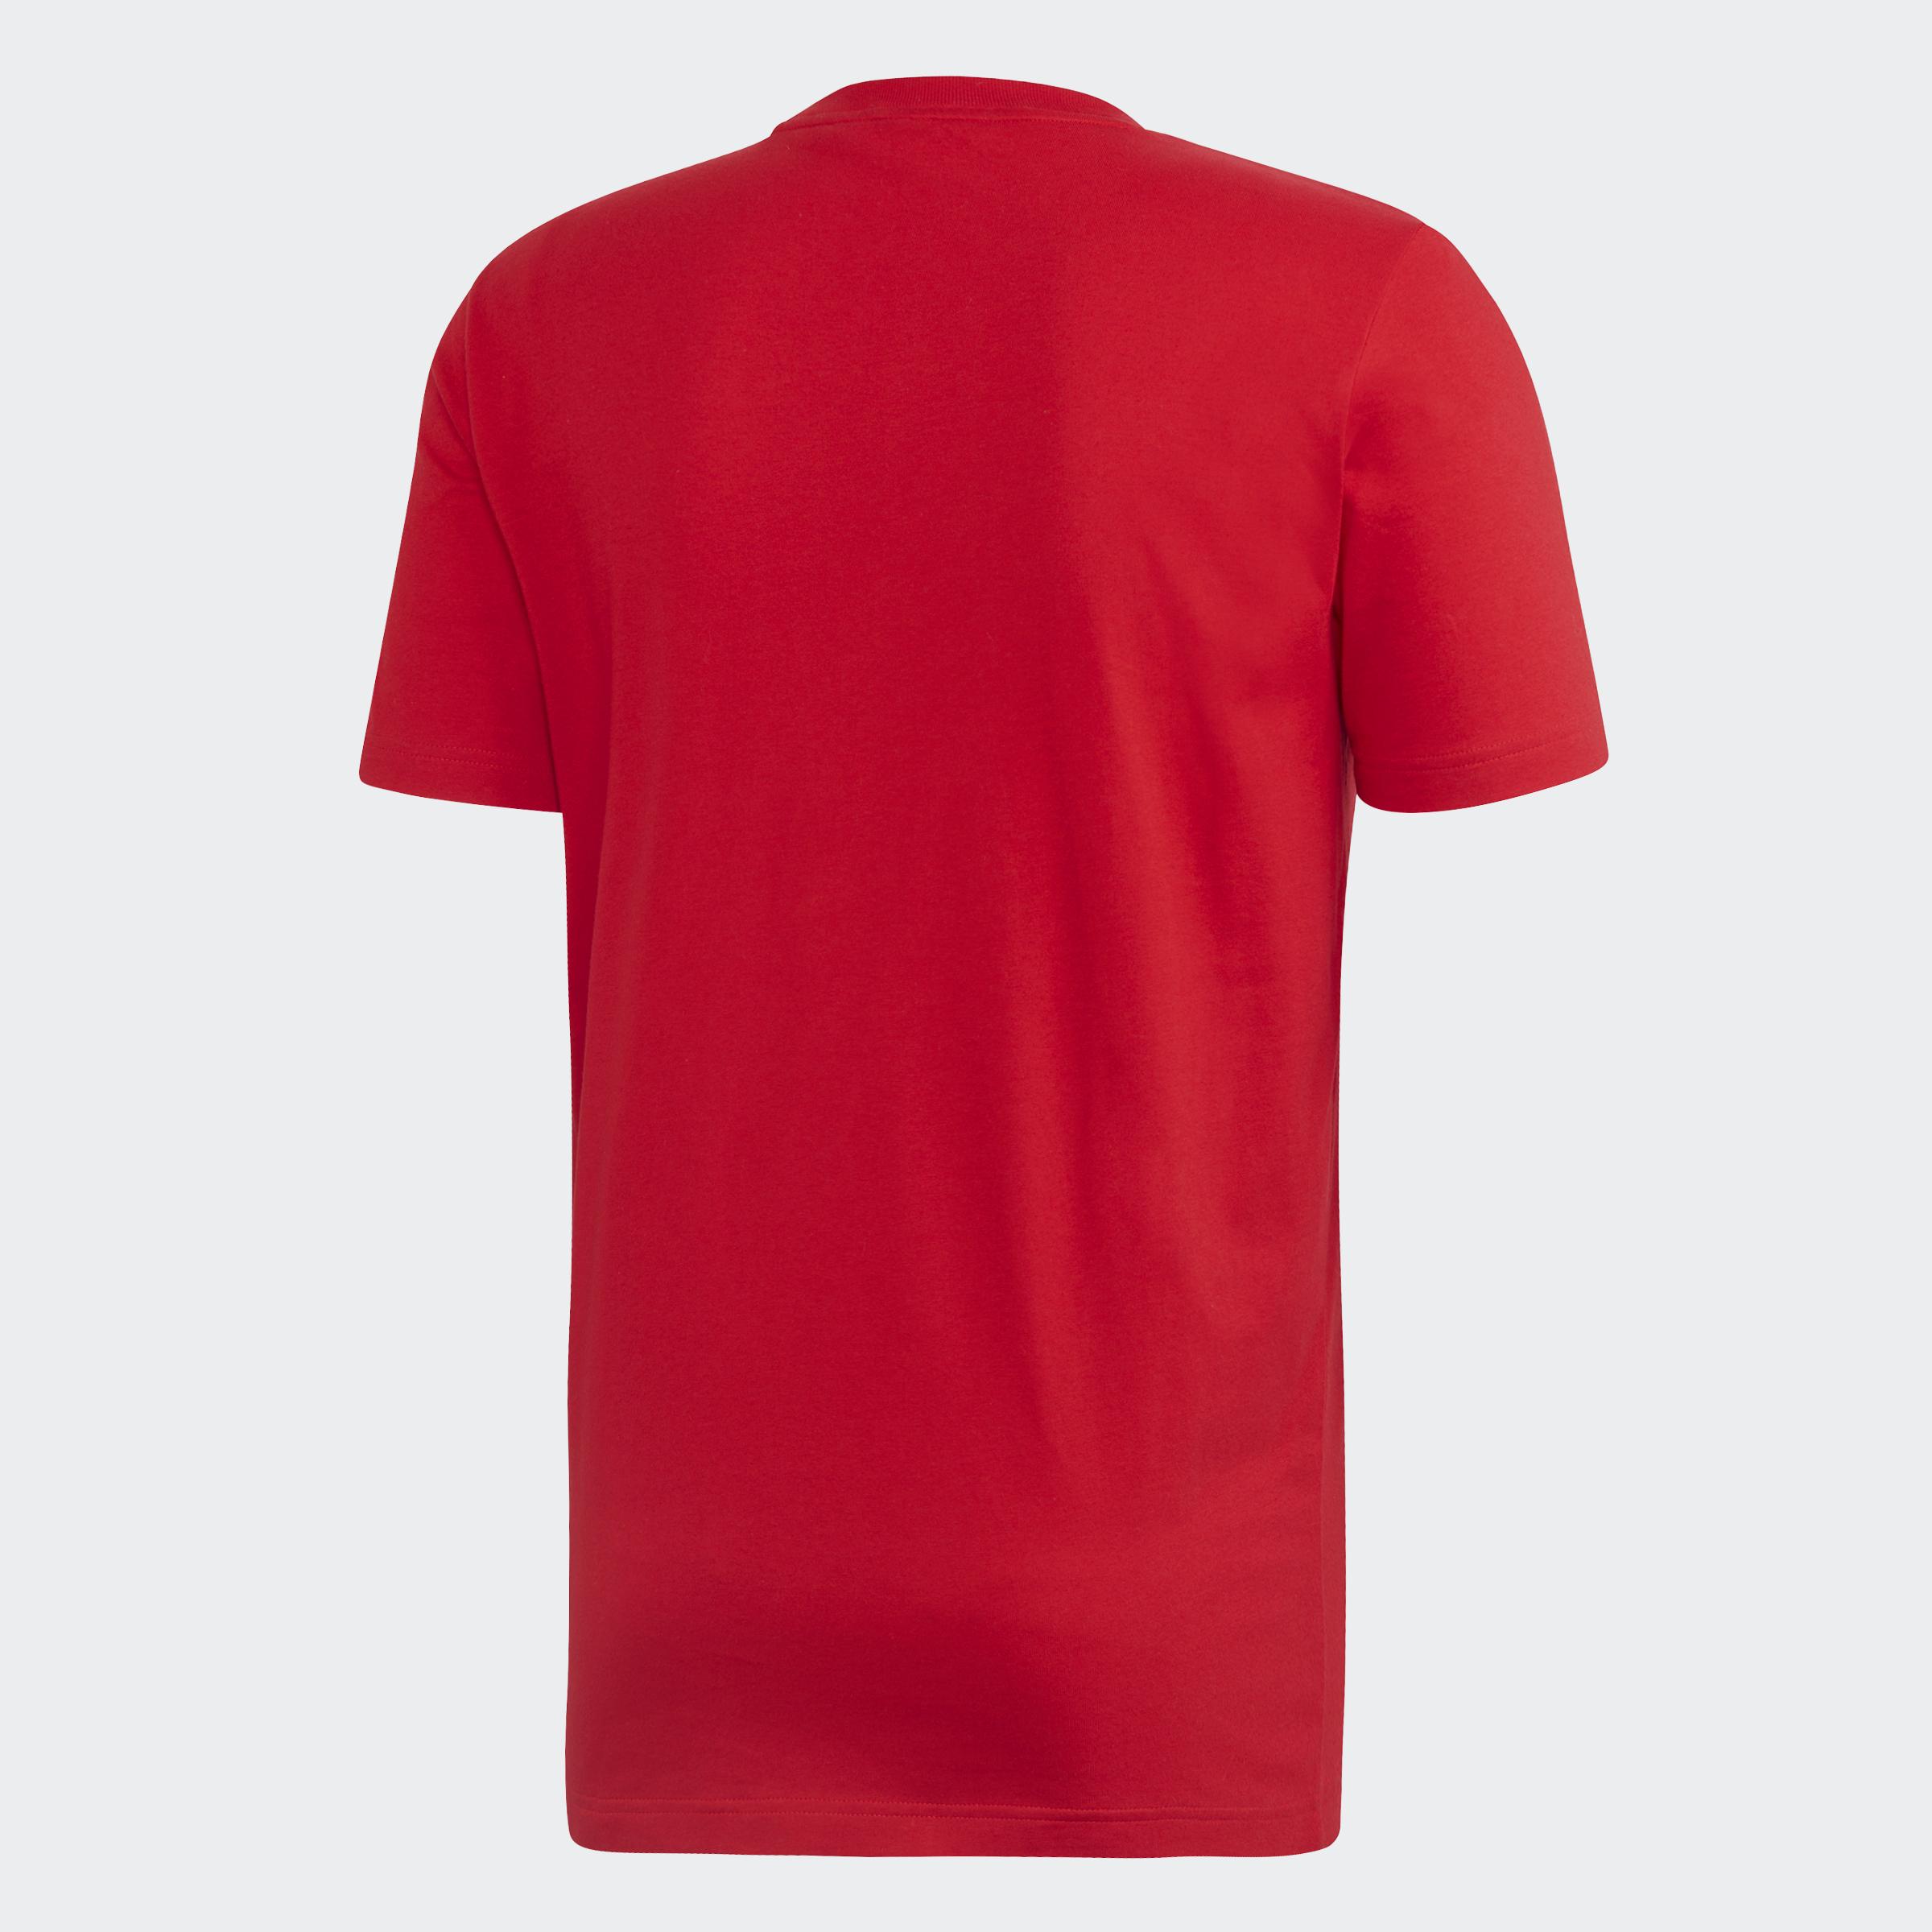 adidas-Must-Haves-Badge-of-Sport-Tee-Men-039-s-Shirts thumbnail 26